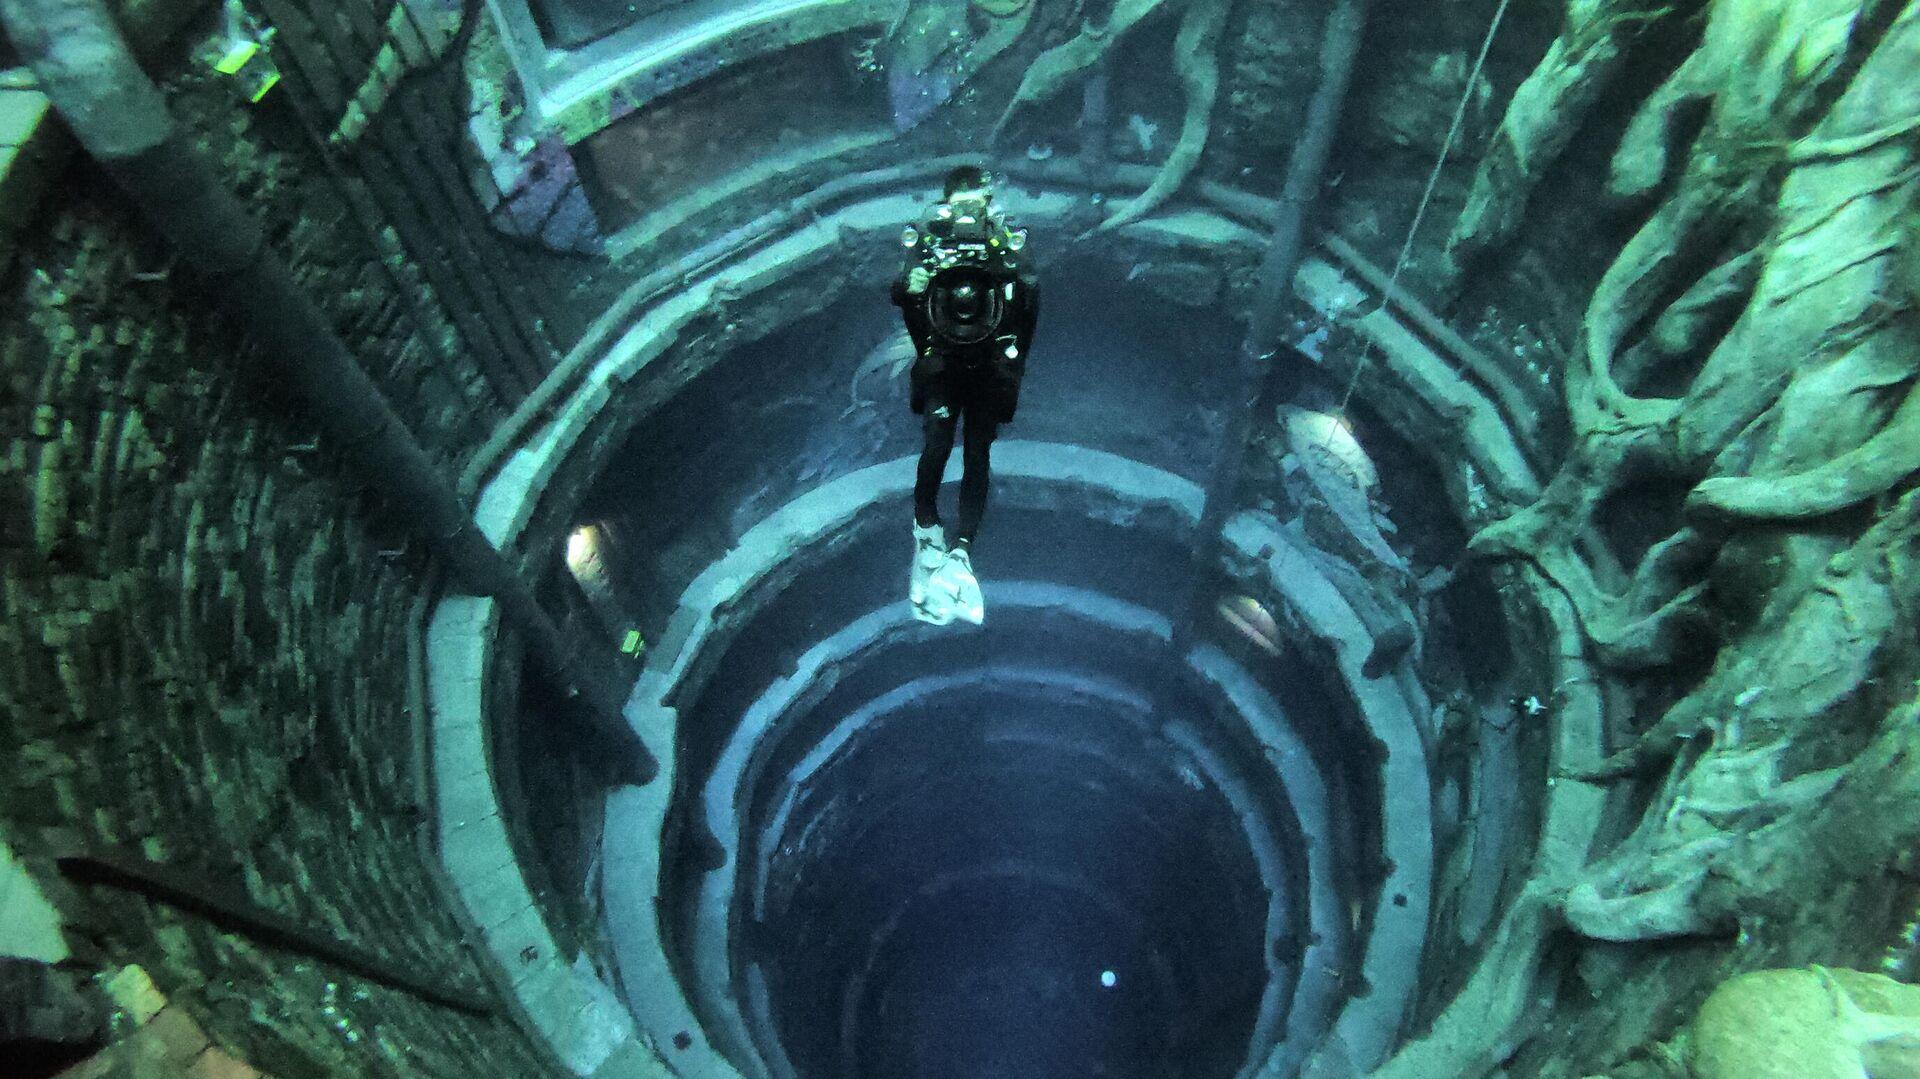 La piscina Deep Dive en Dubái - Sputnik Mundo, 1920, 12.07.2021